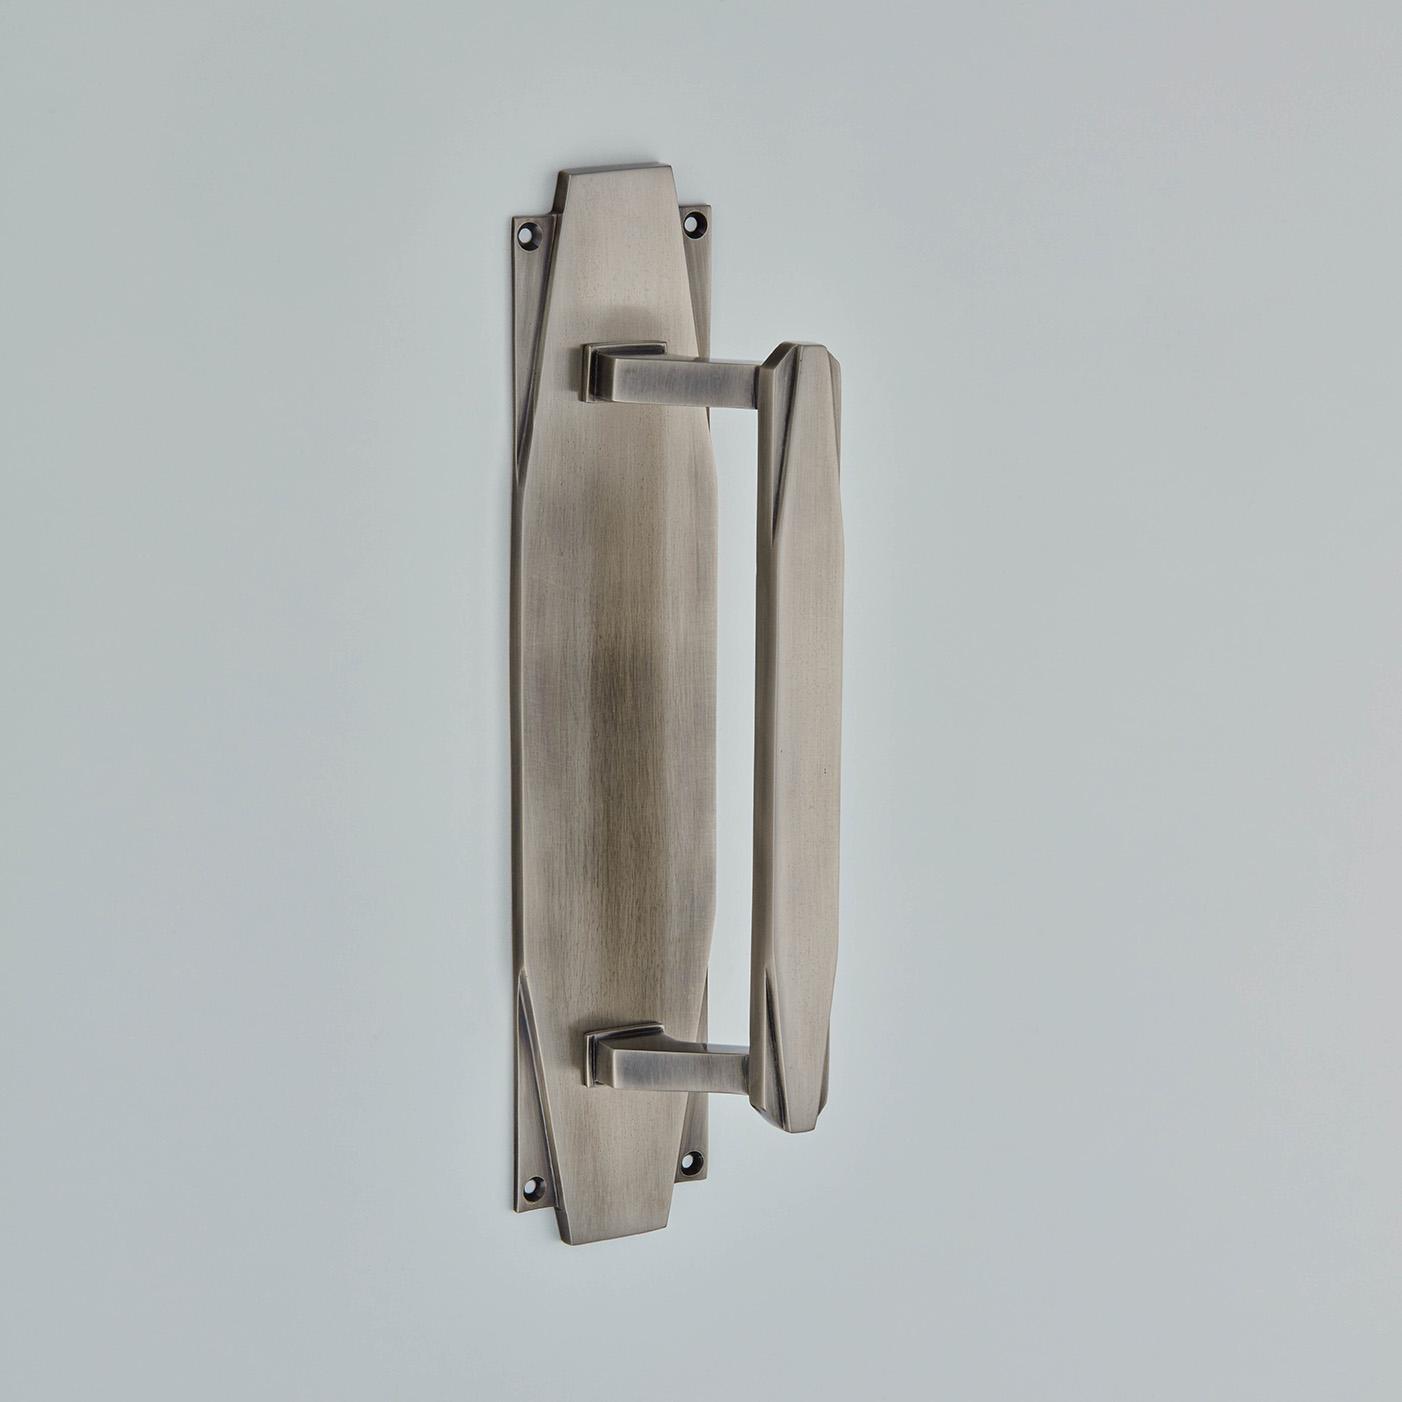 Art Deco Pull Handle on Backplate